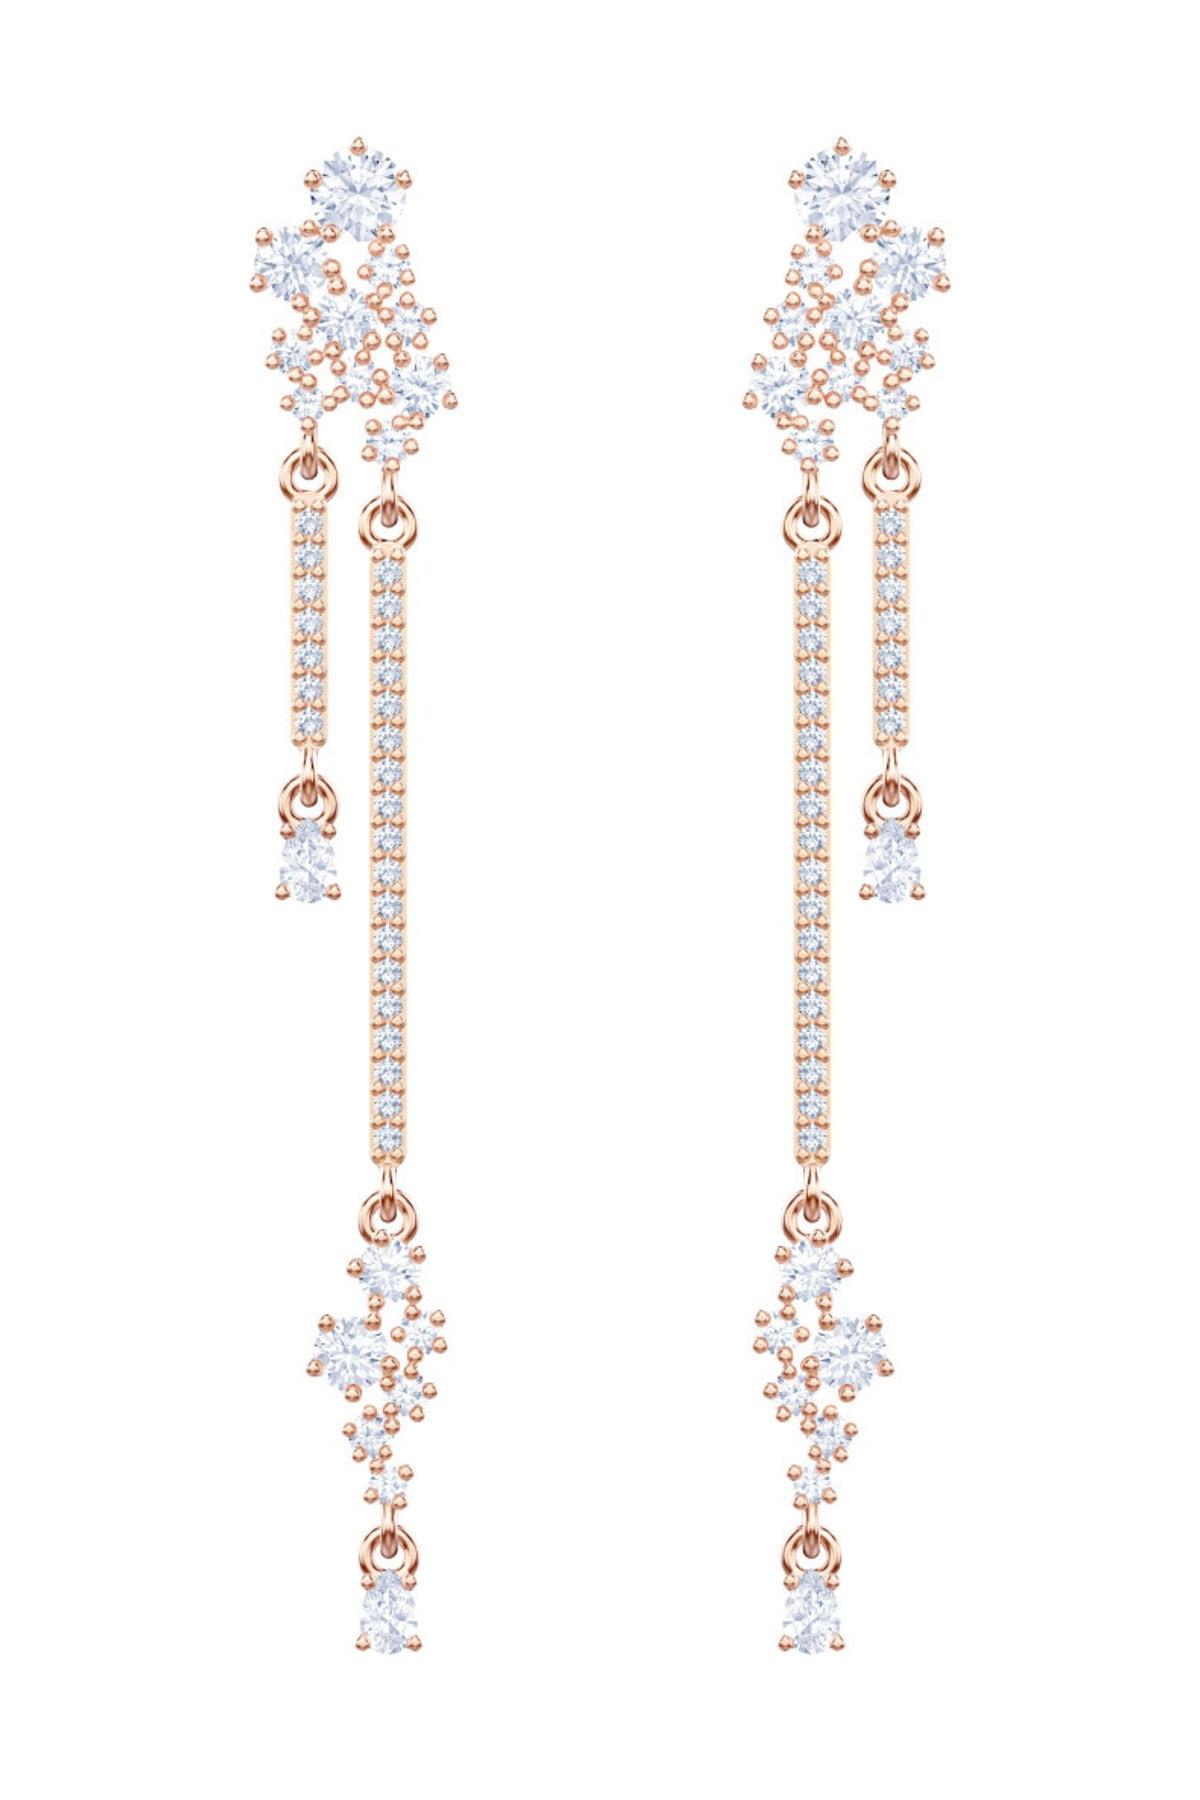 Swarovski Küpe Moonsun Pierced Earrings Drop Czwh/Ros 5486635 1